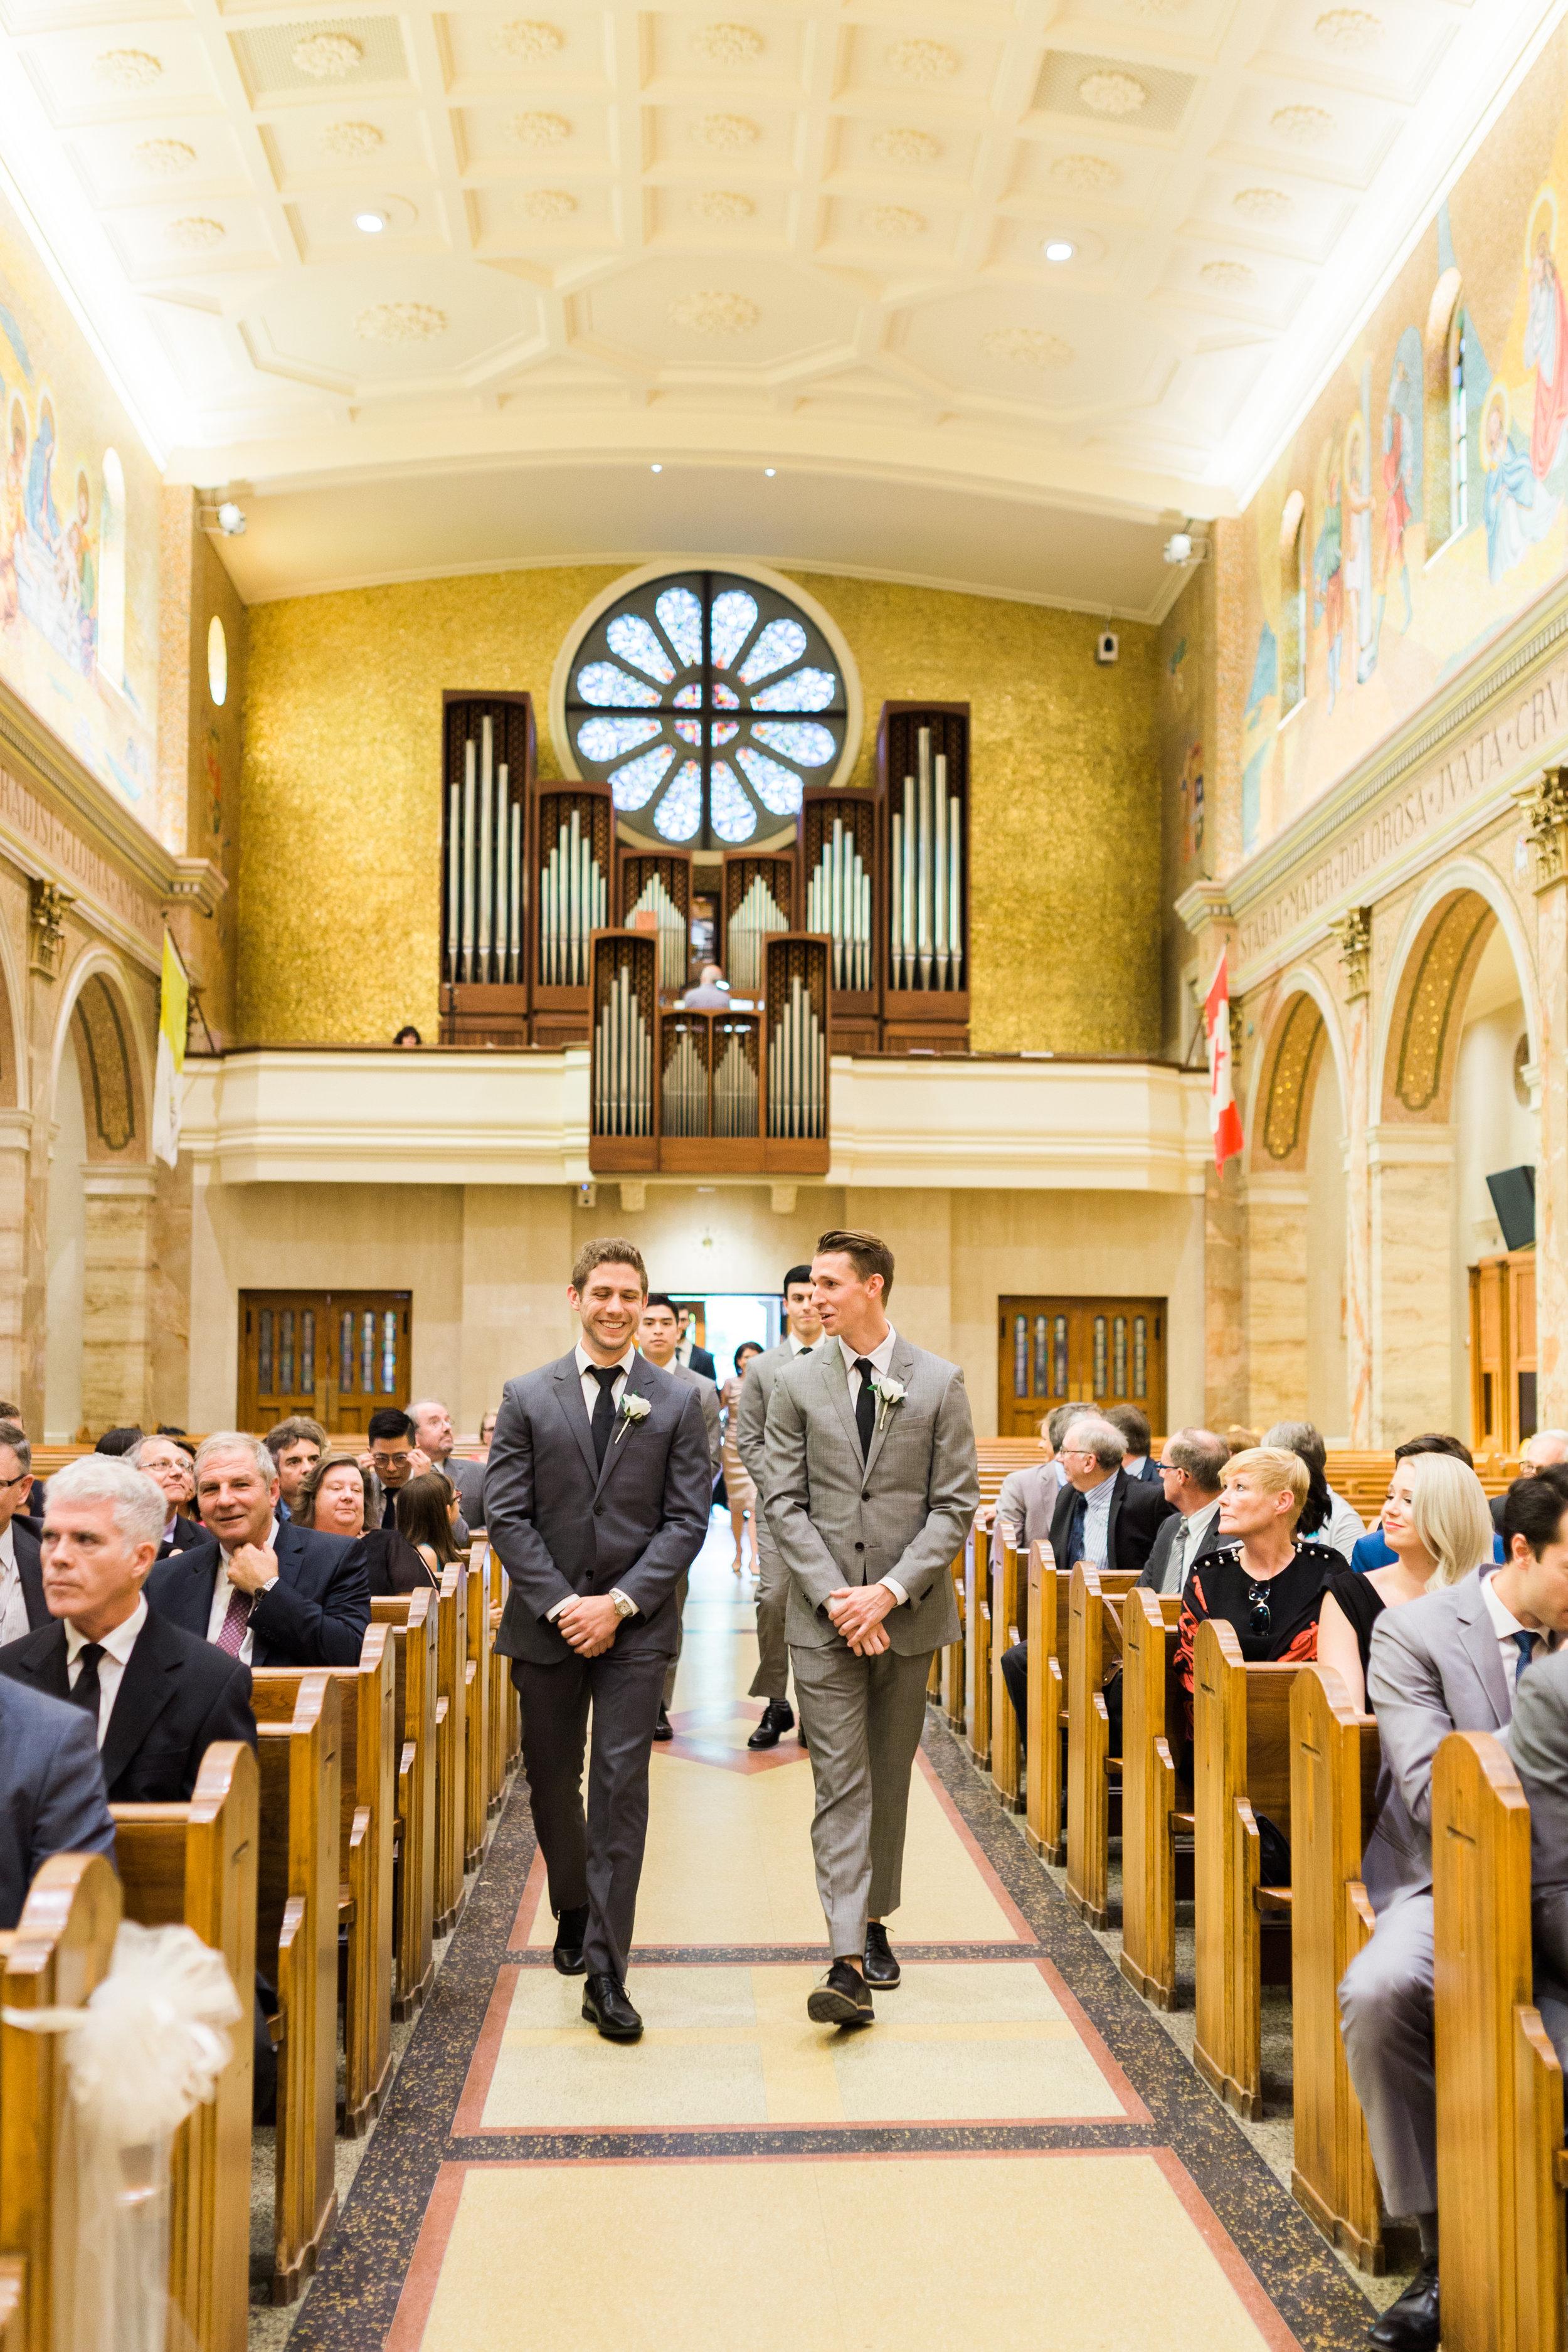 Toronto Fine Art Photographer - Lady of Sorrows Catholic Church Wedding - Ceremony-23.jpg